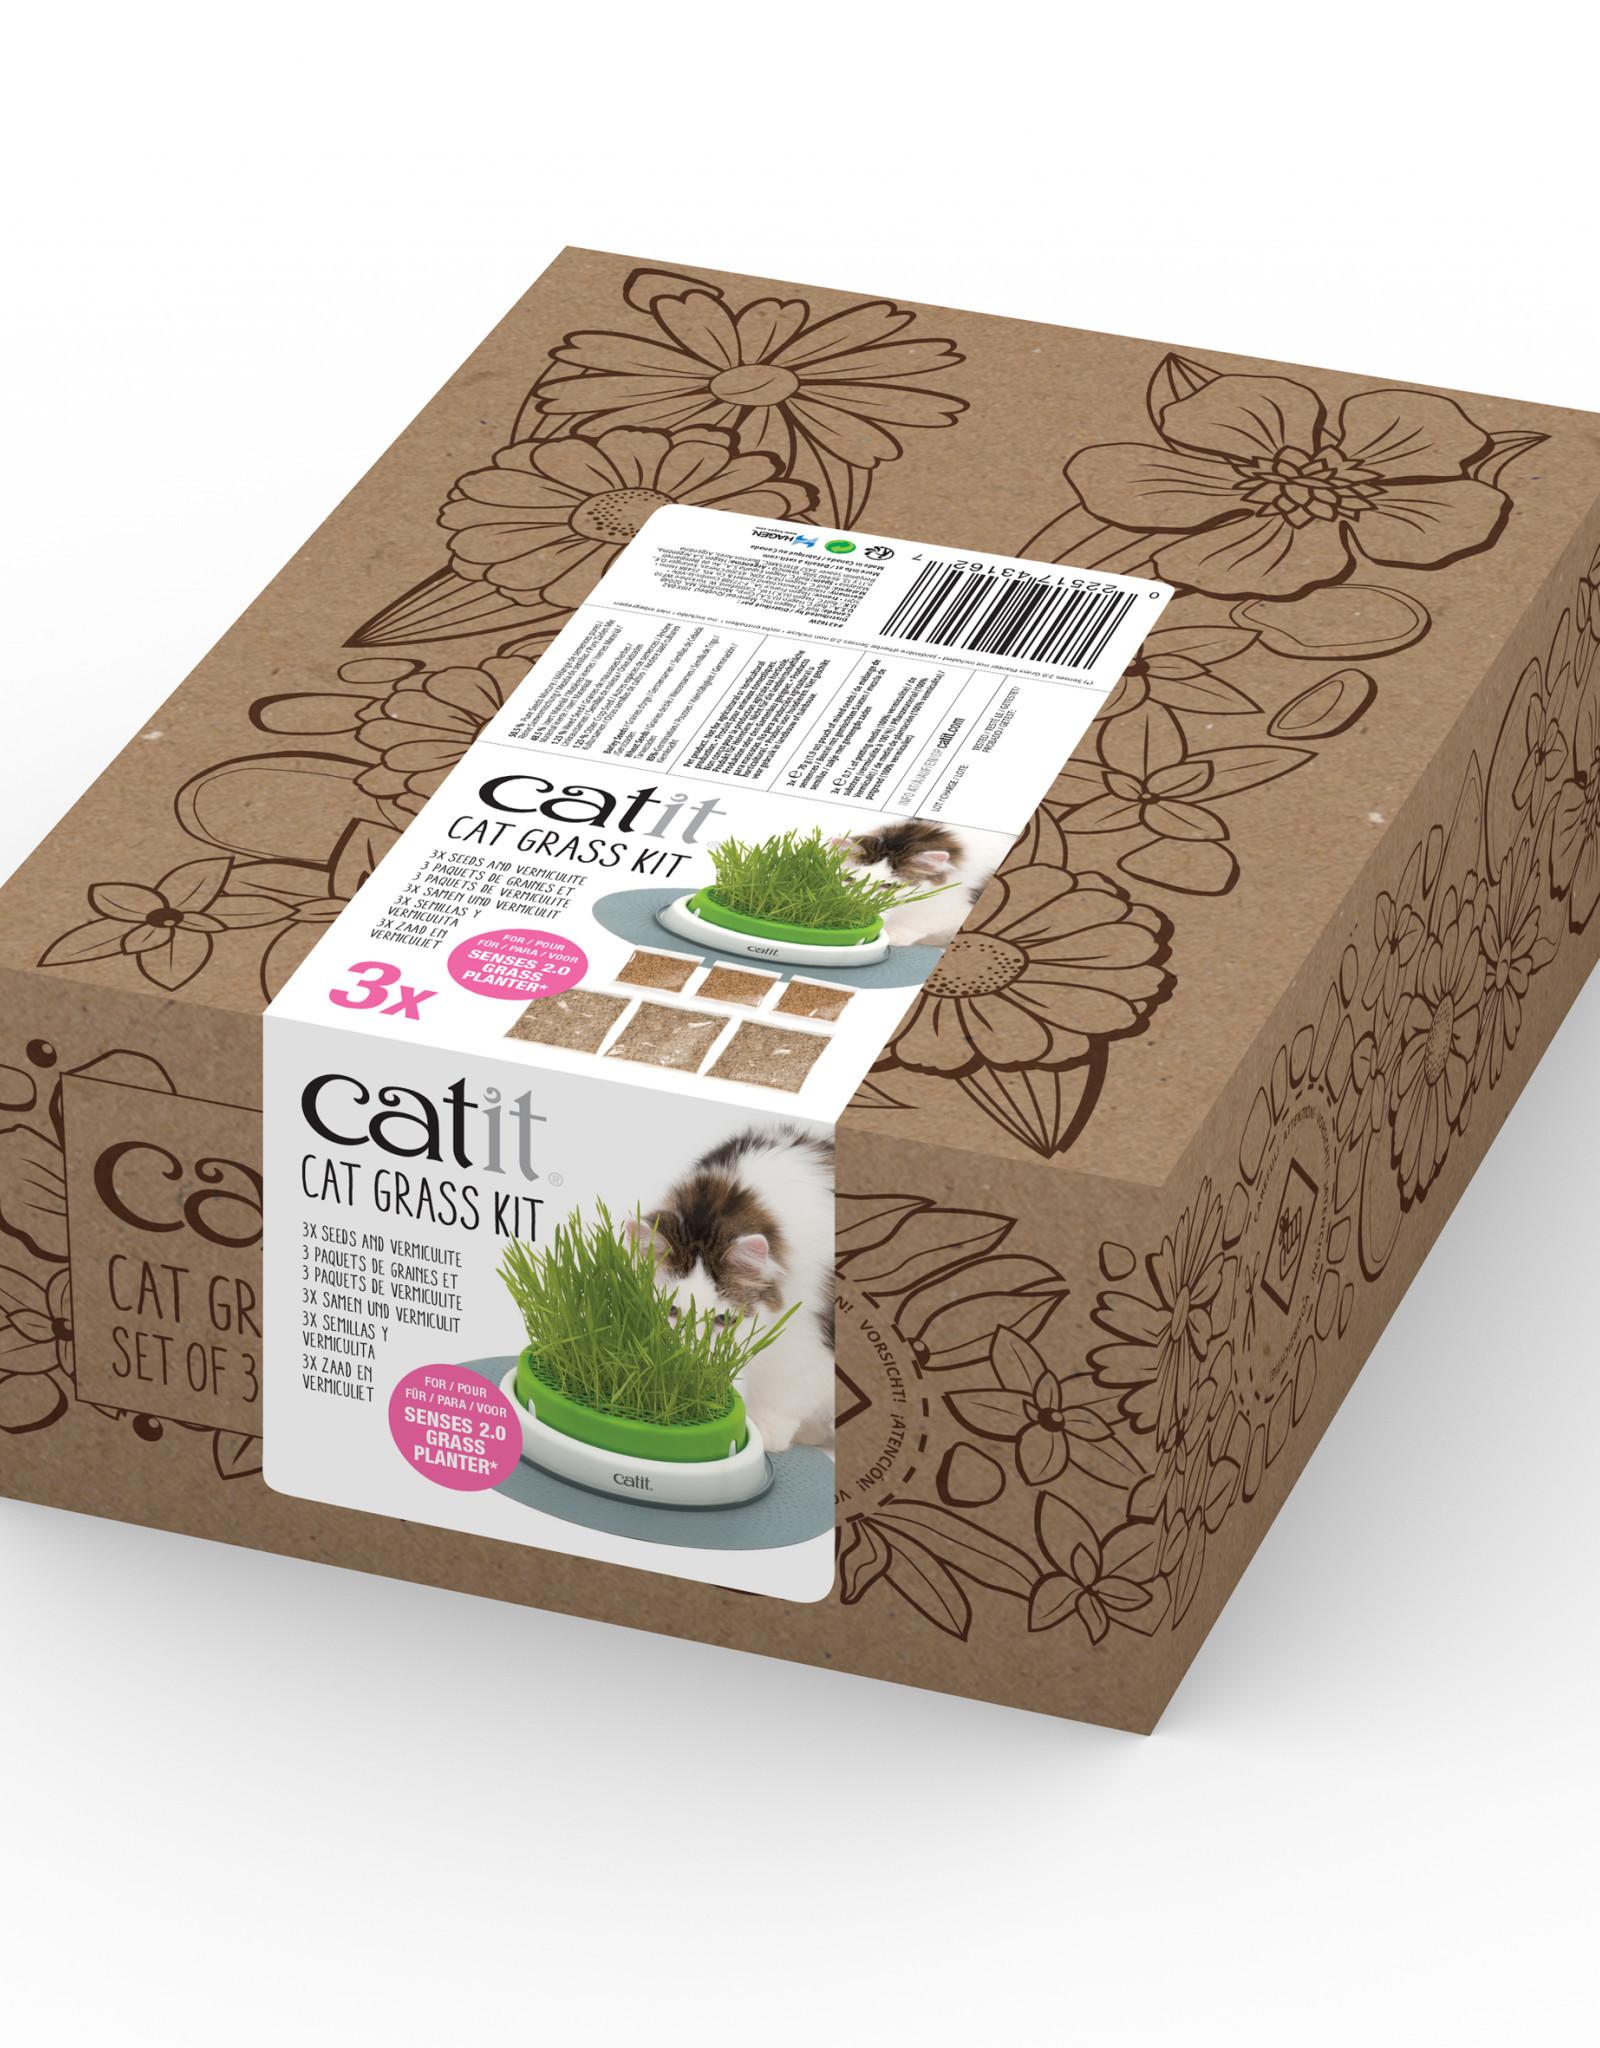 Hagen Catit Senses 2.0 grass planter kit